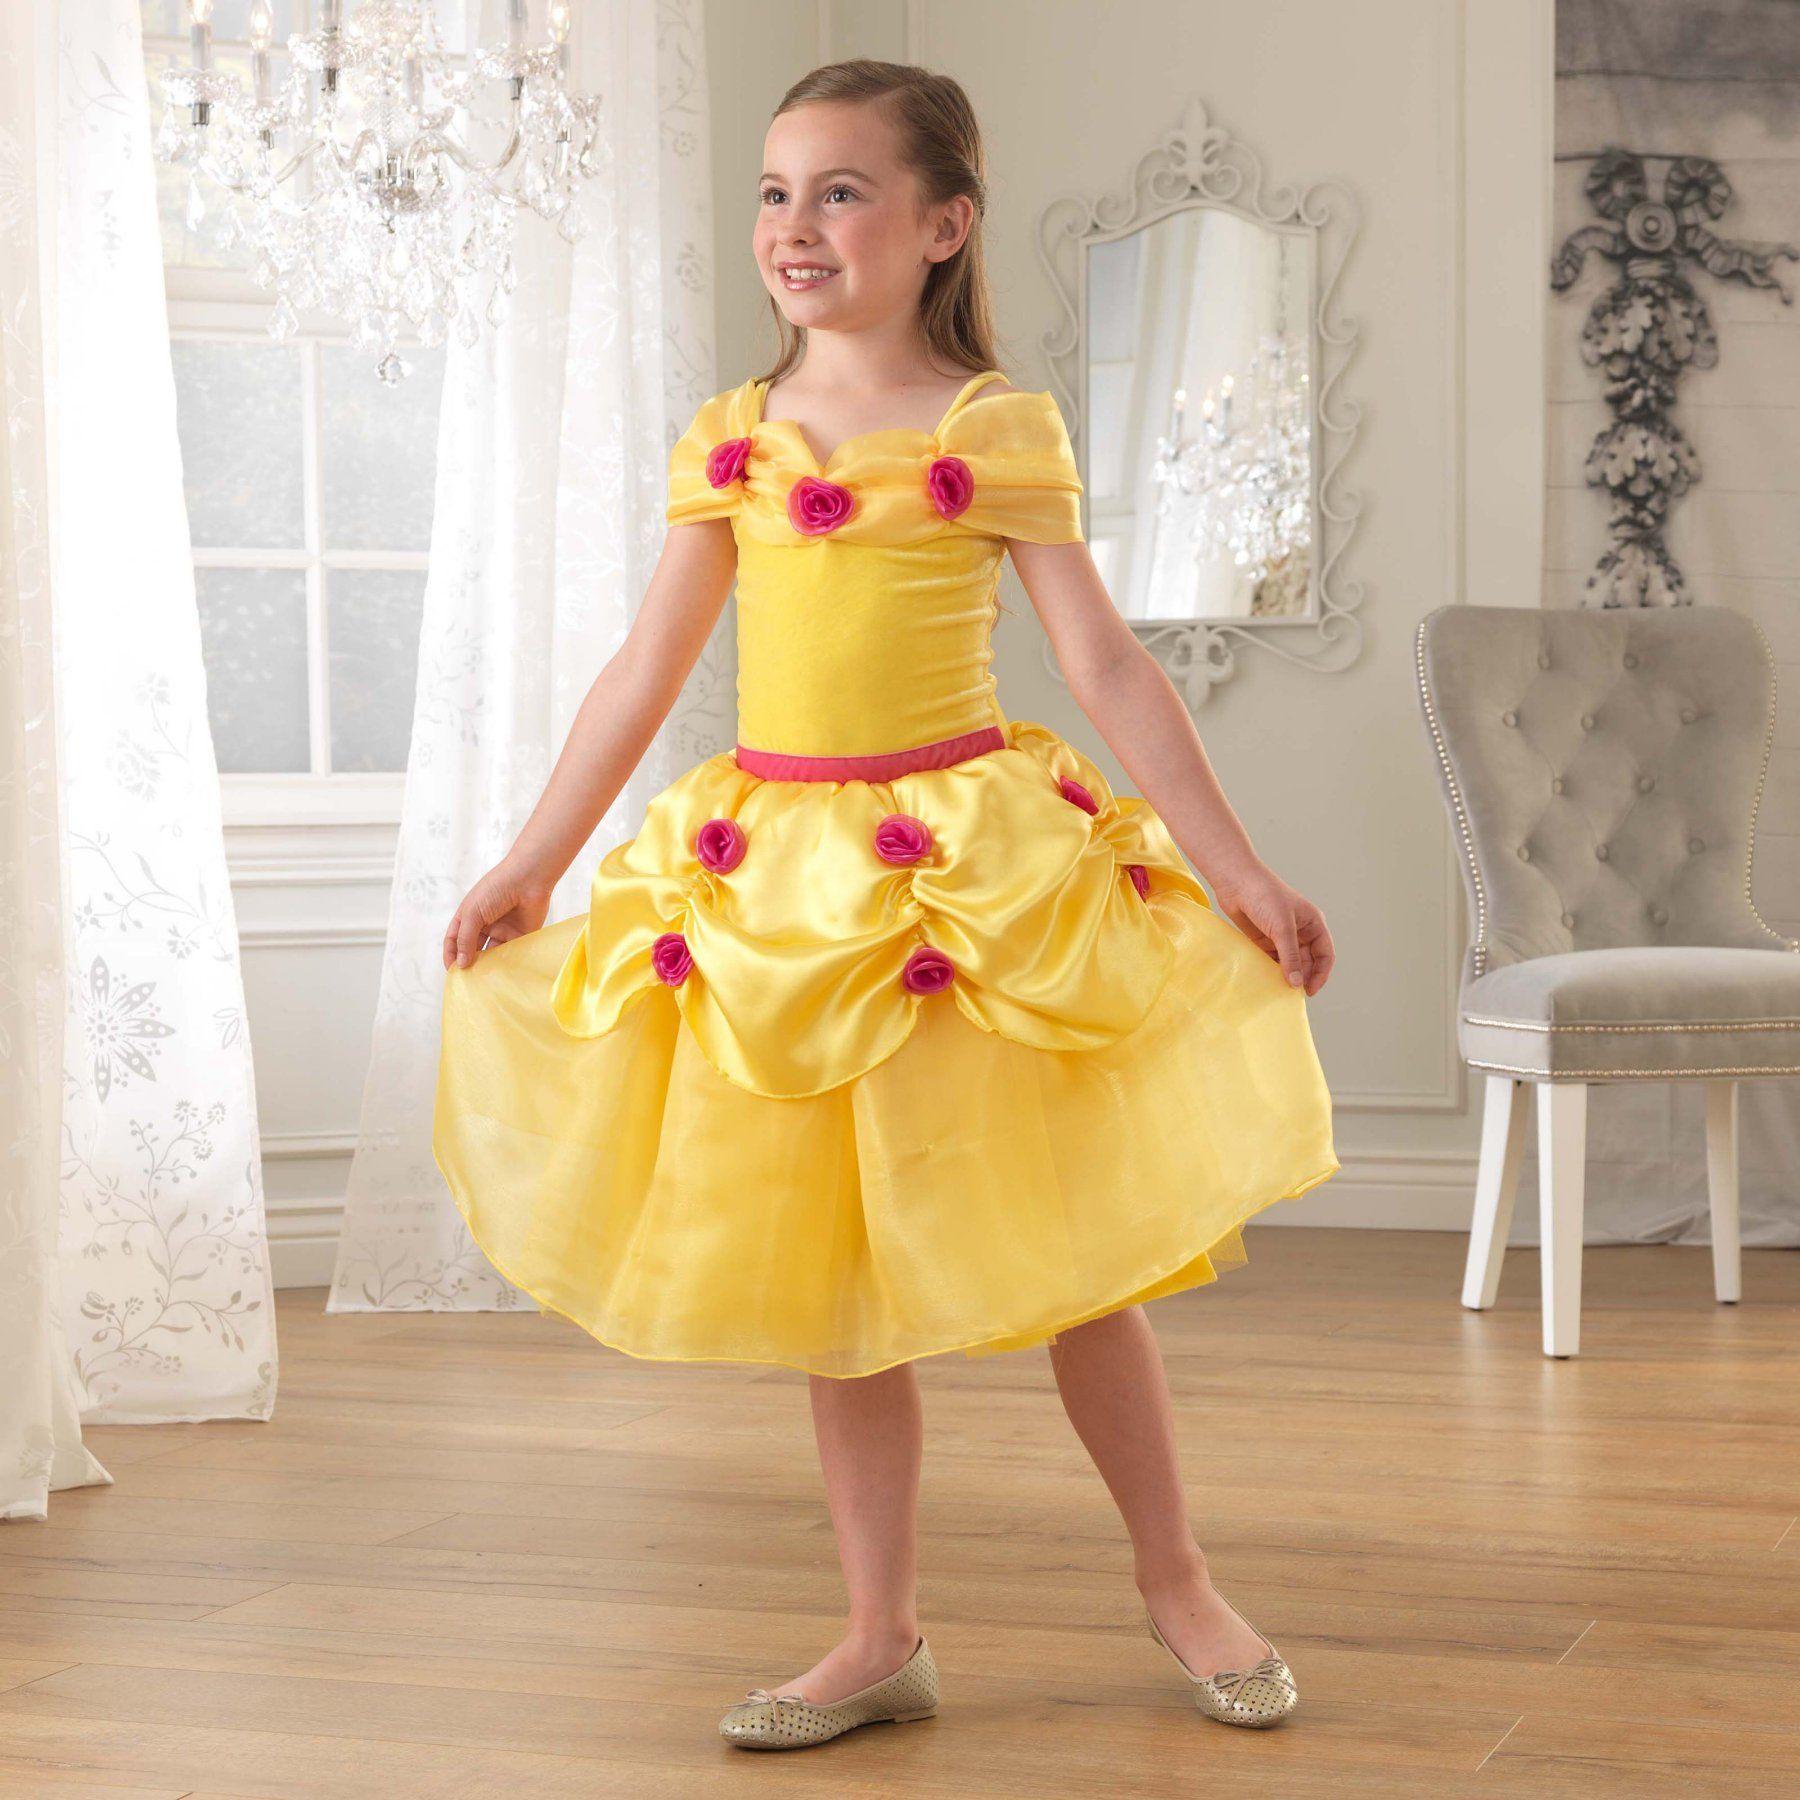 KidKraft Yellow Rose Princess Costume - 63396